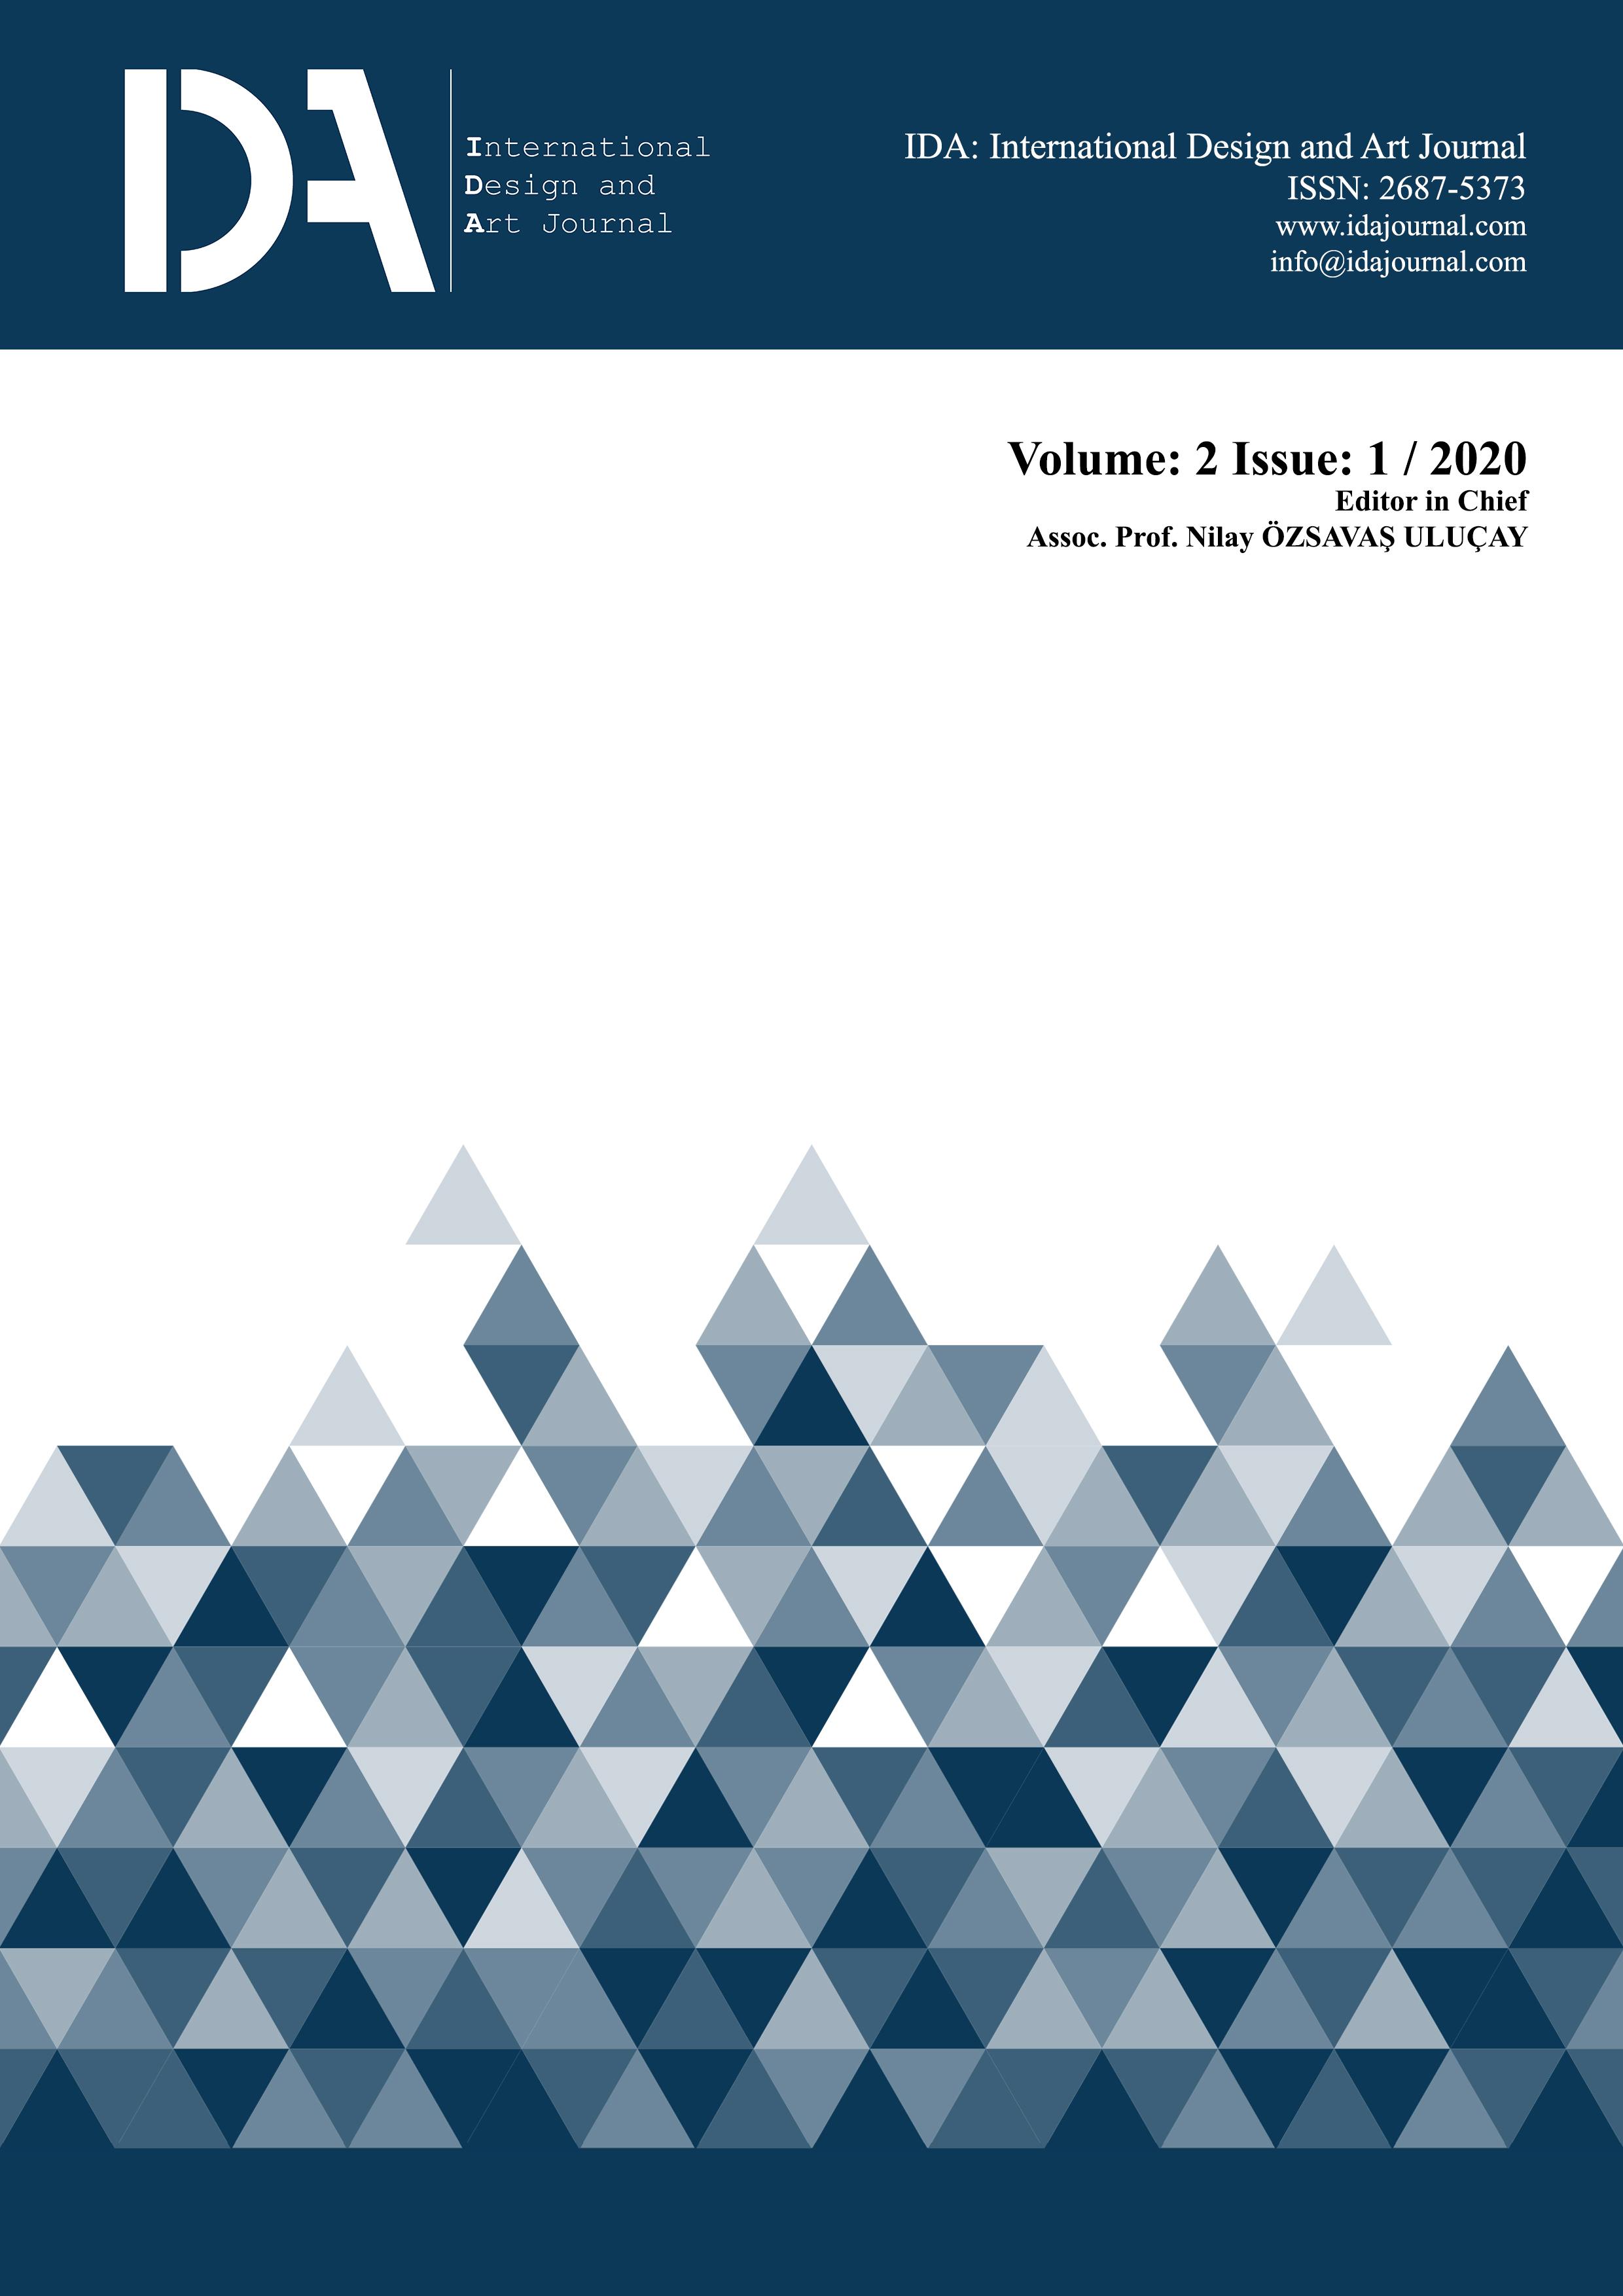 View Vol. 2 No. 1 (2020): IDA: International Design and Art Journal